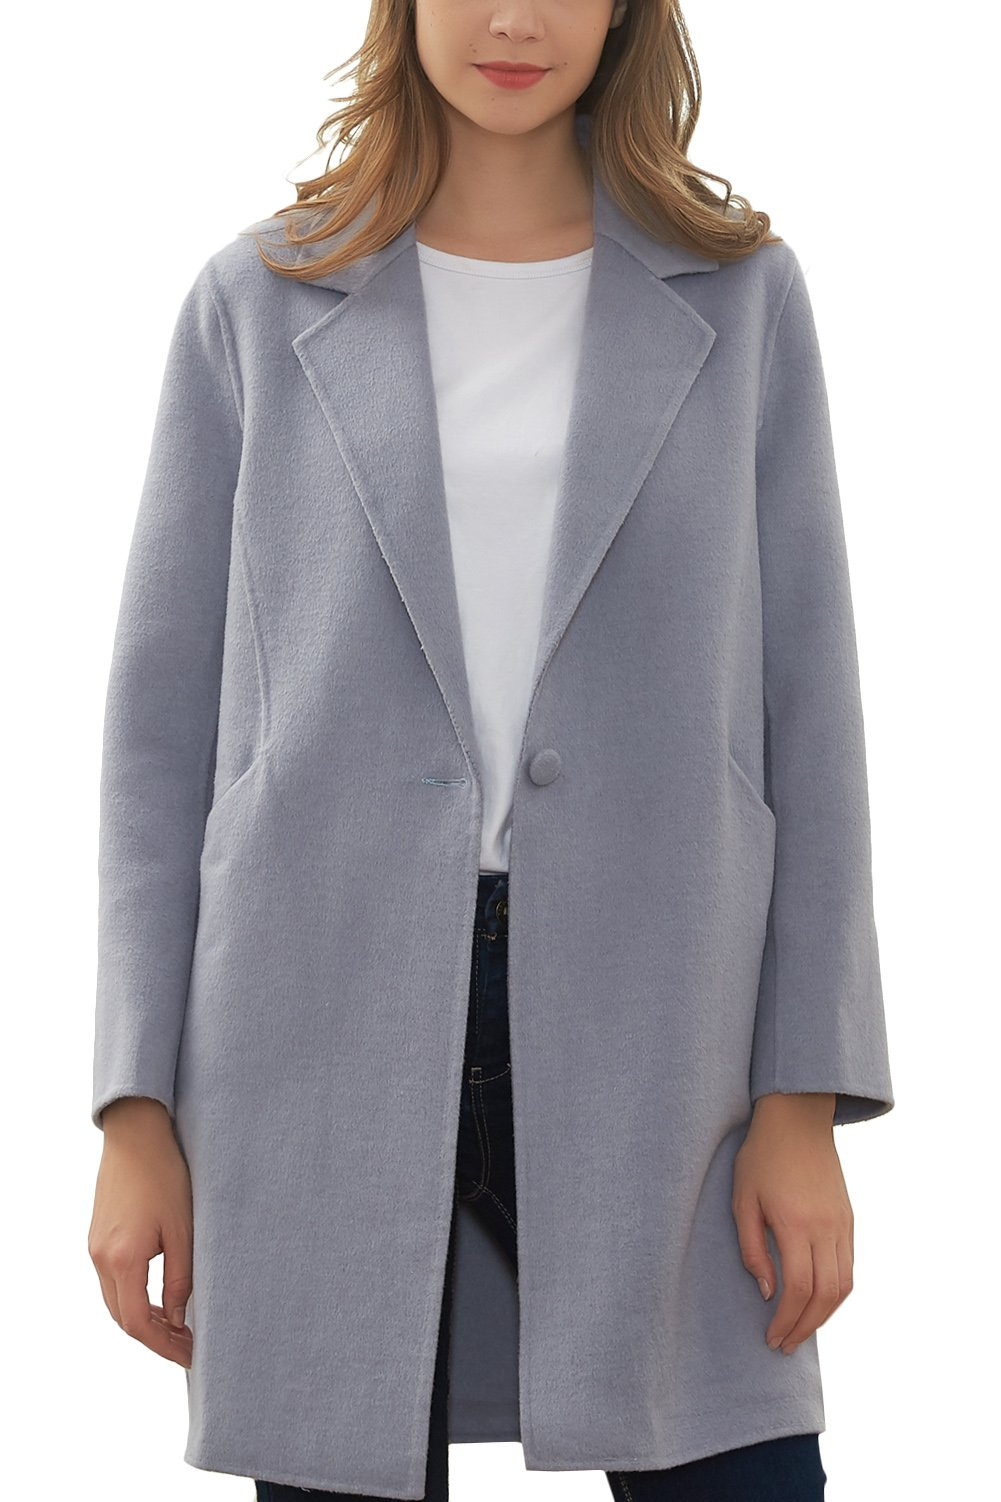 Hanayome Women's Warm Winter Wool Coat Lapel One Button Regular Fit Trench Jacket MI25 (Grey, 10)